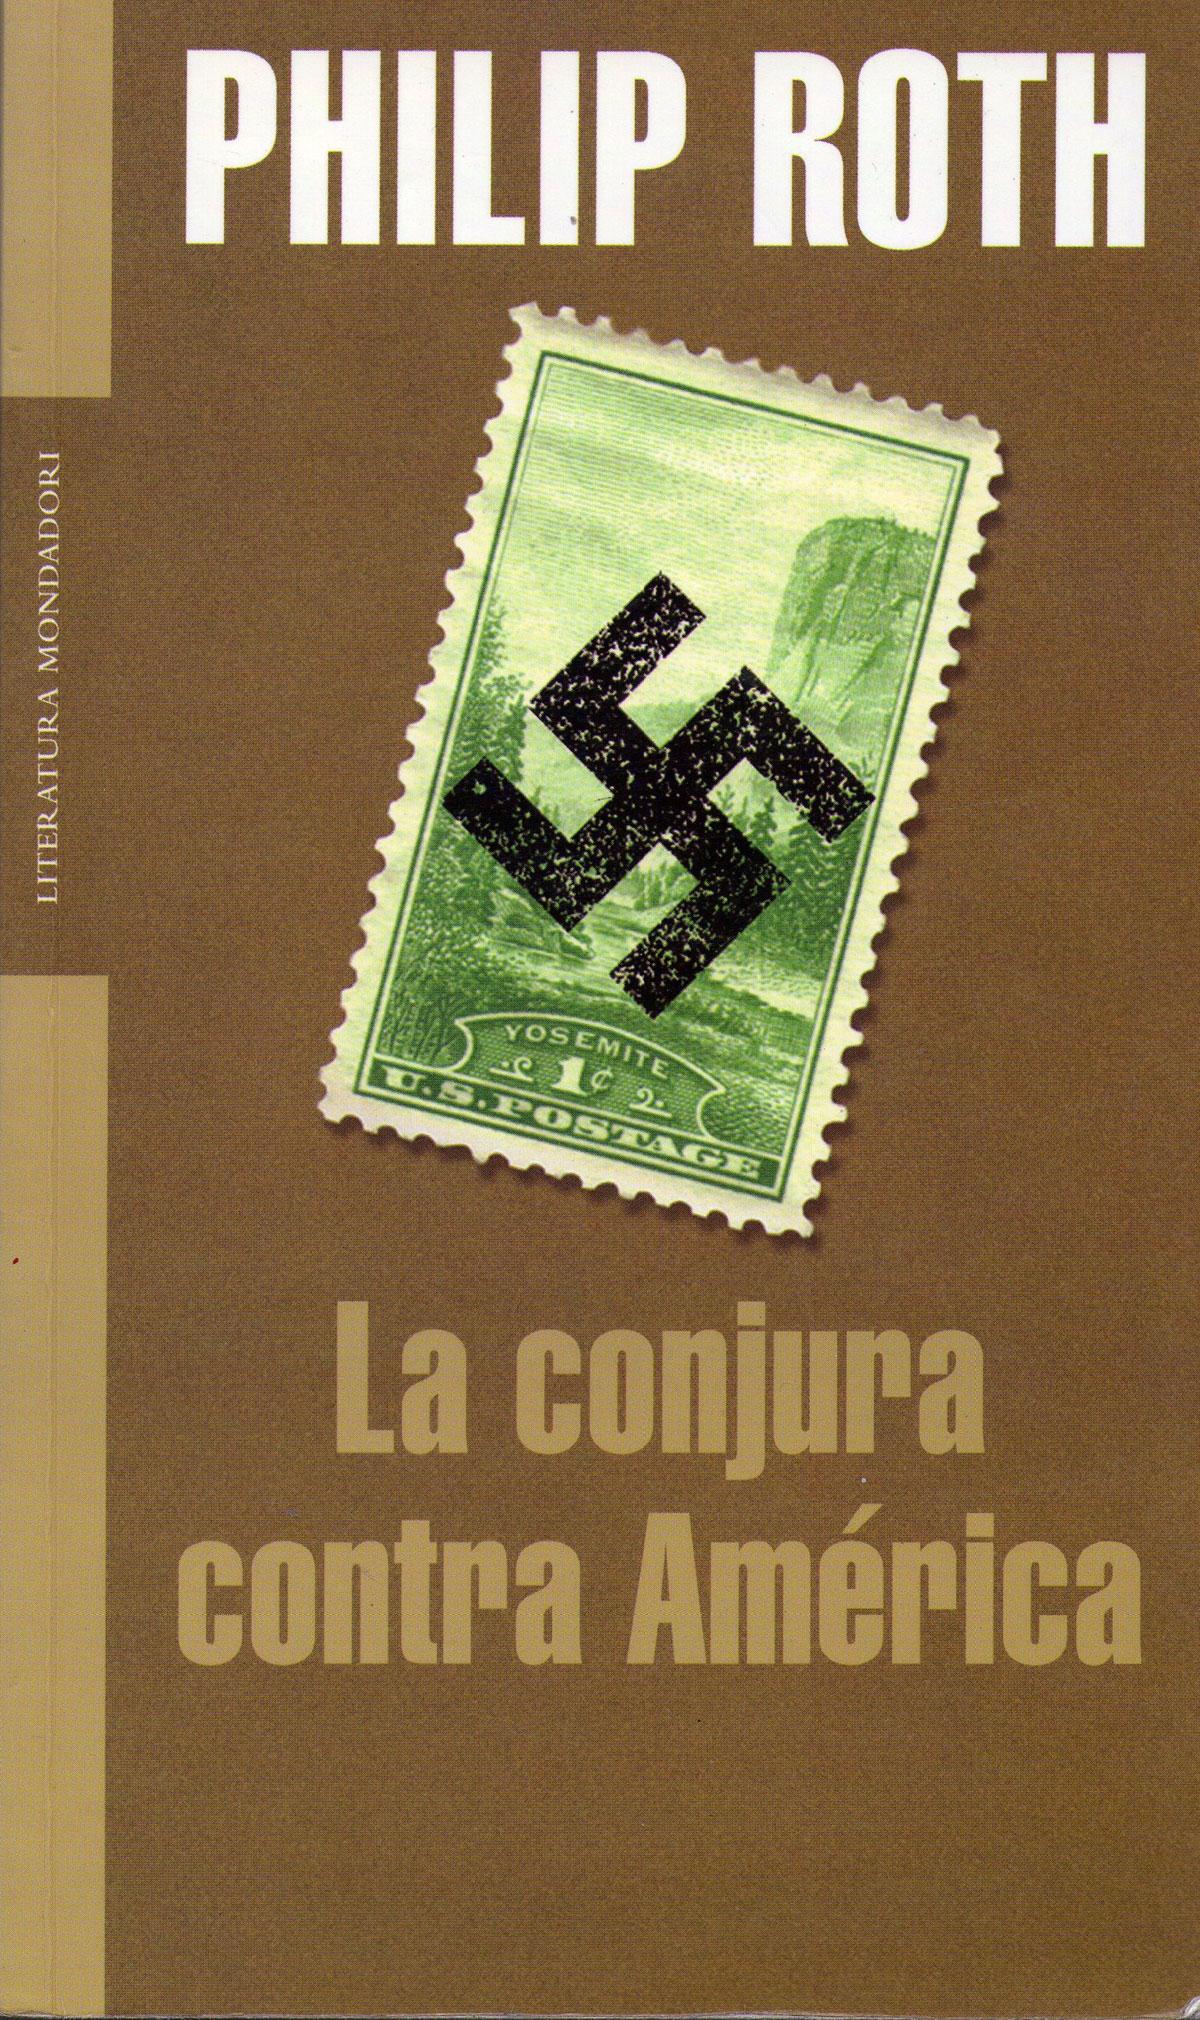 Portada de la novela La conjura contra América, de Philip Roth